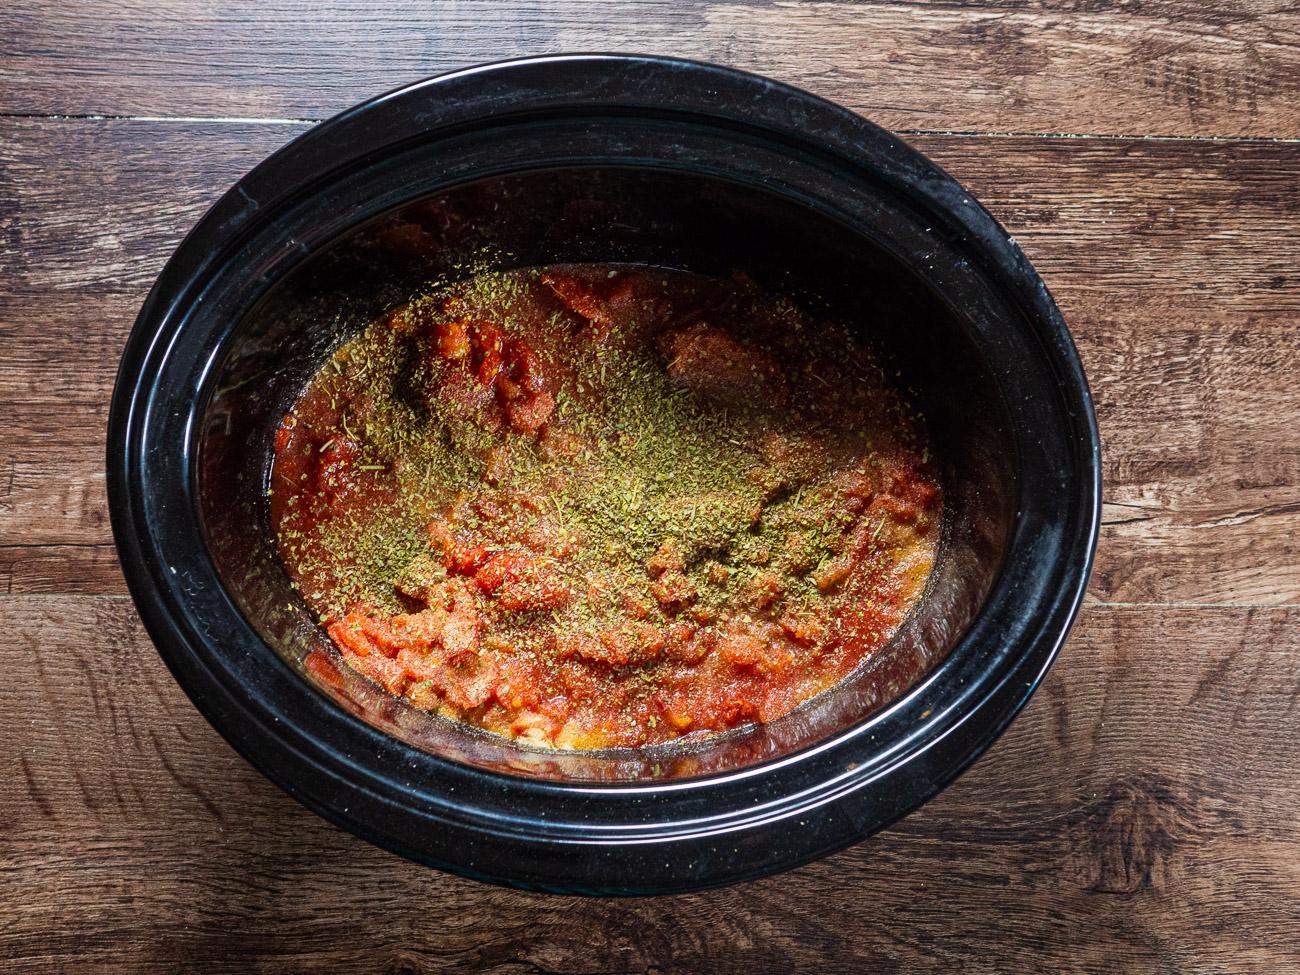 Stir in garlic powder, Italian seasoning, salt, and pepper, then add the stock and Velveeta. Cook on high for 1 hour.